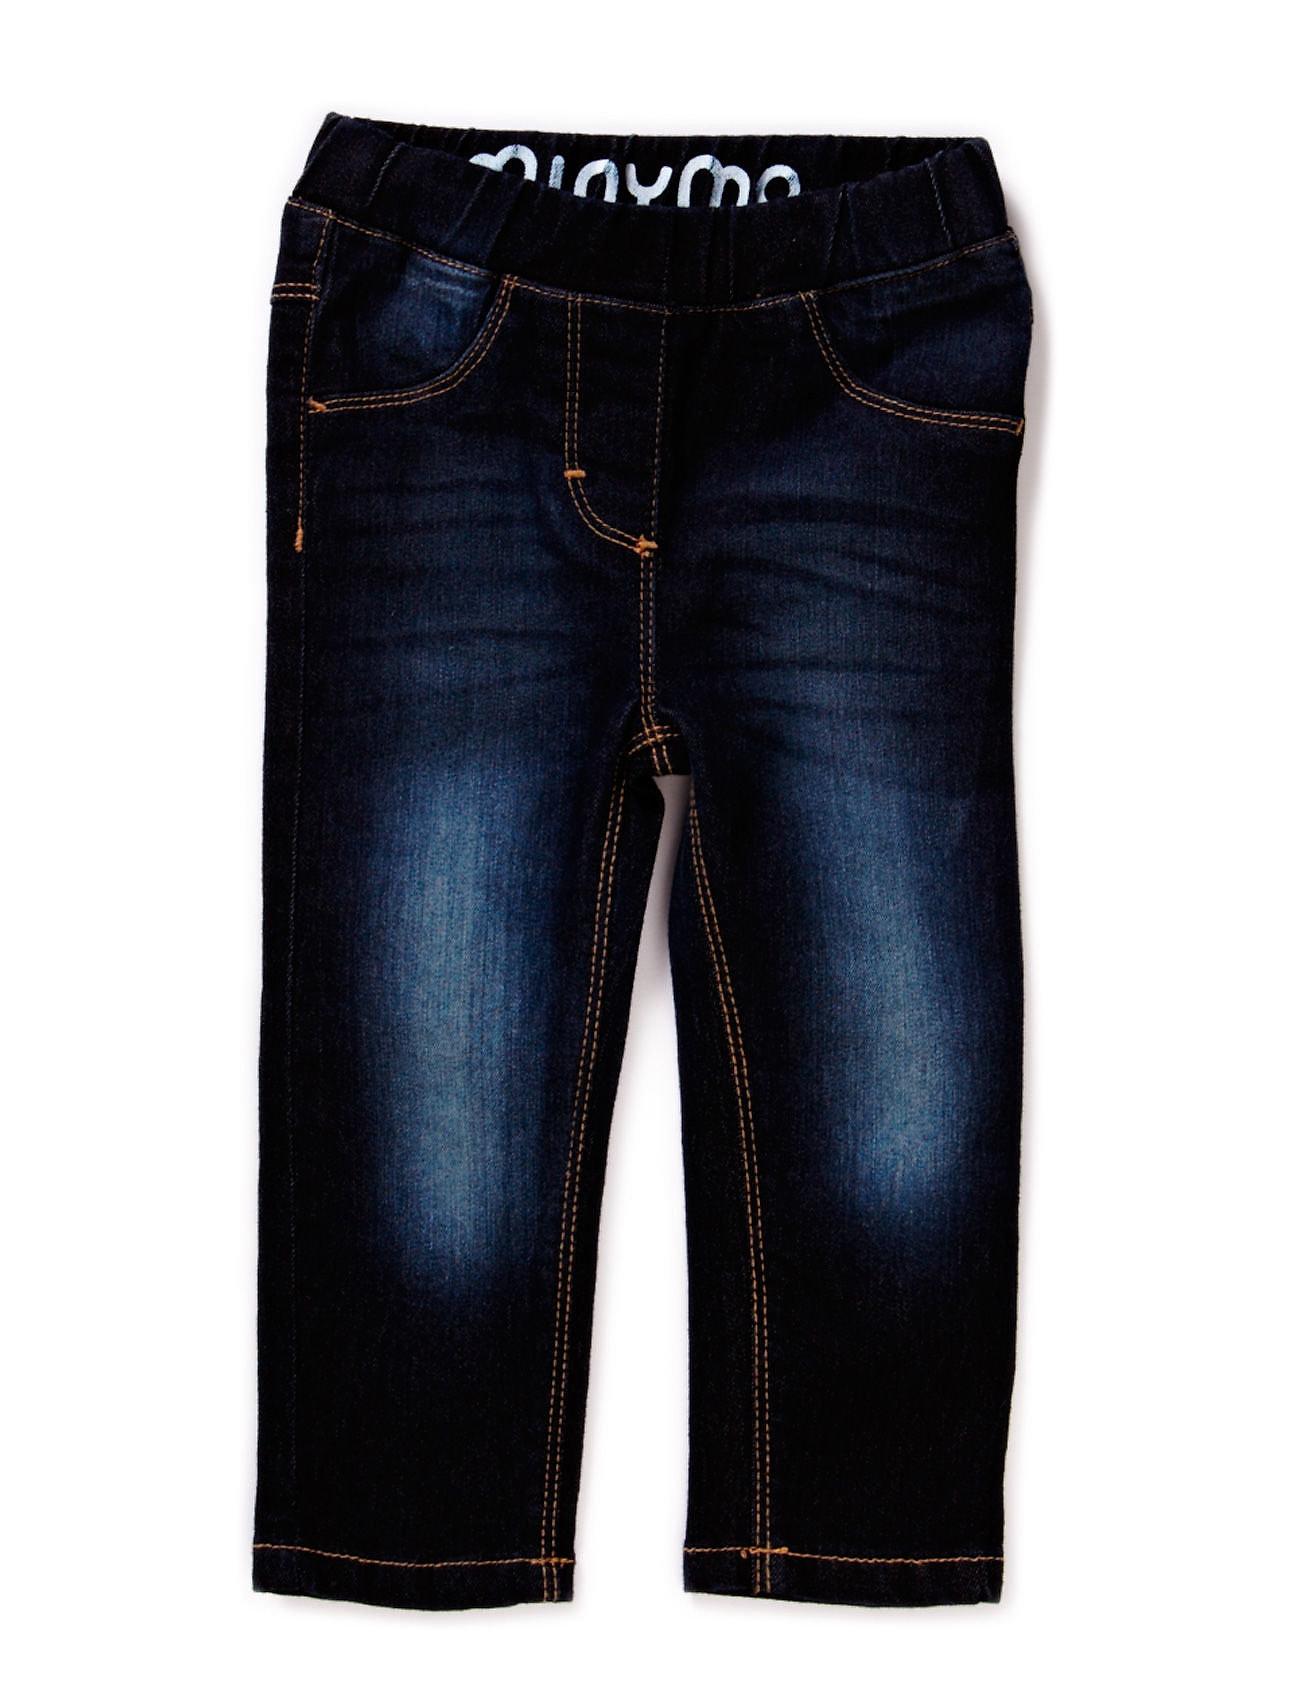 Minymo Jeans girl - Slim fit